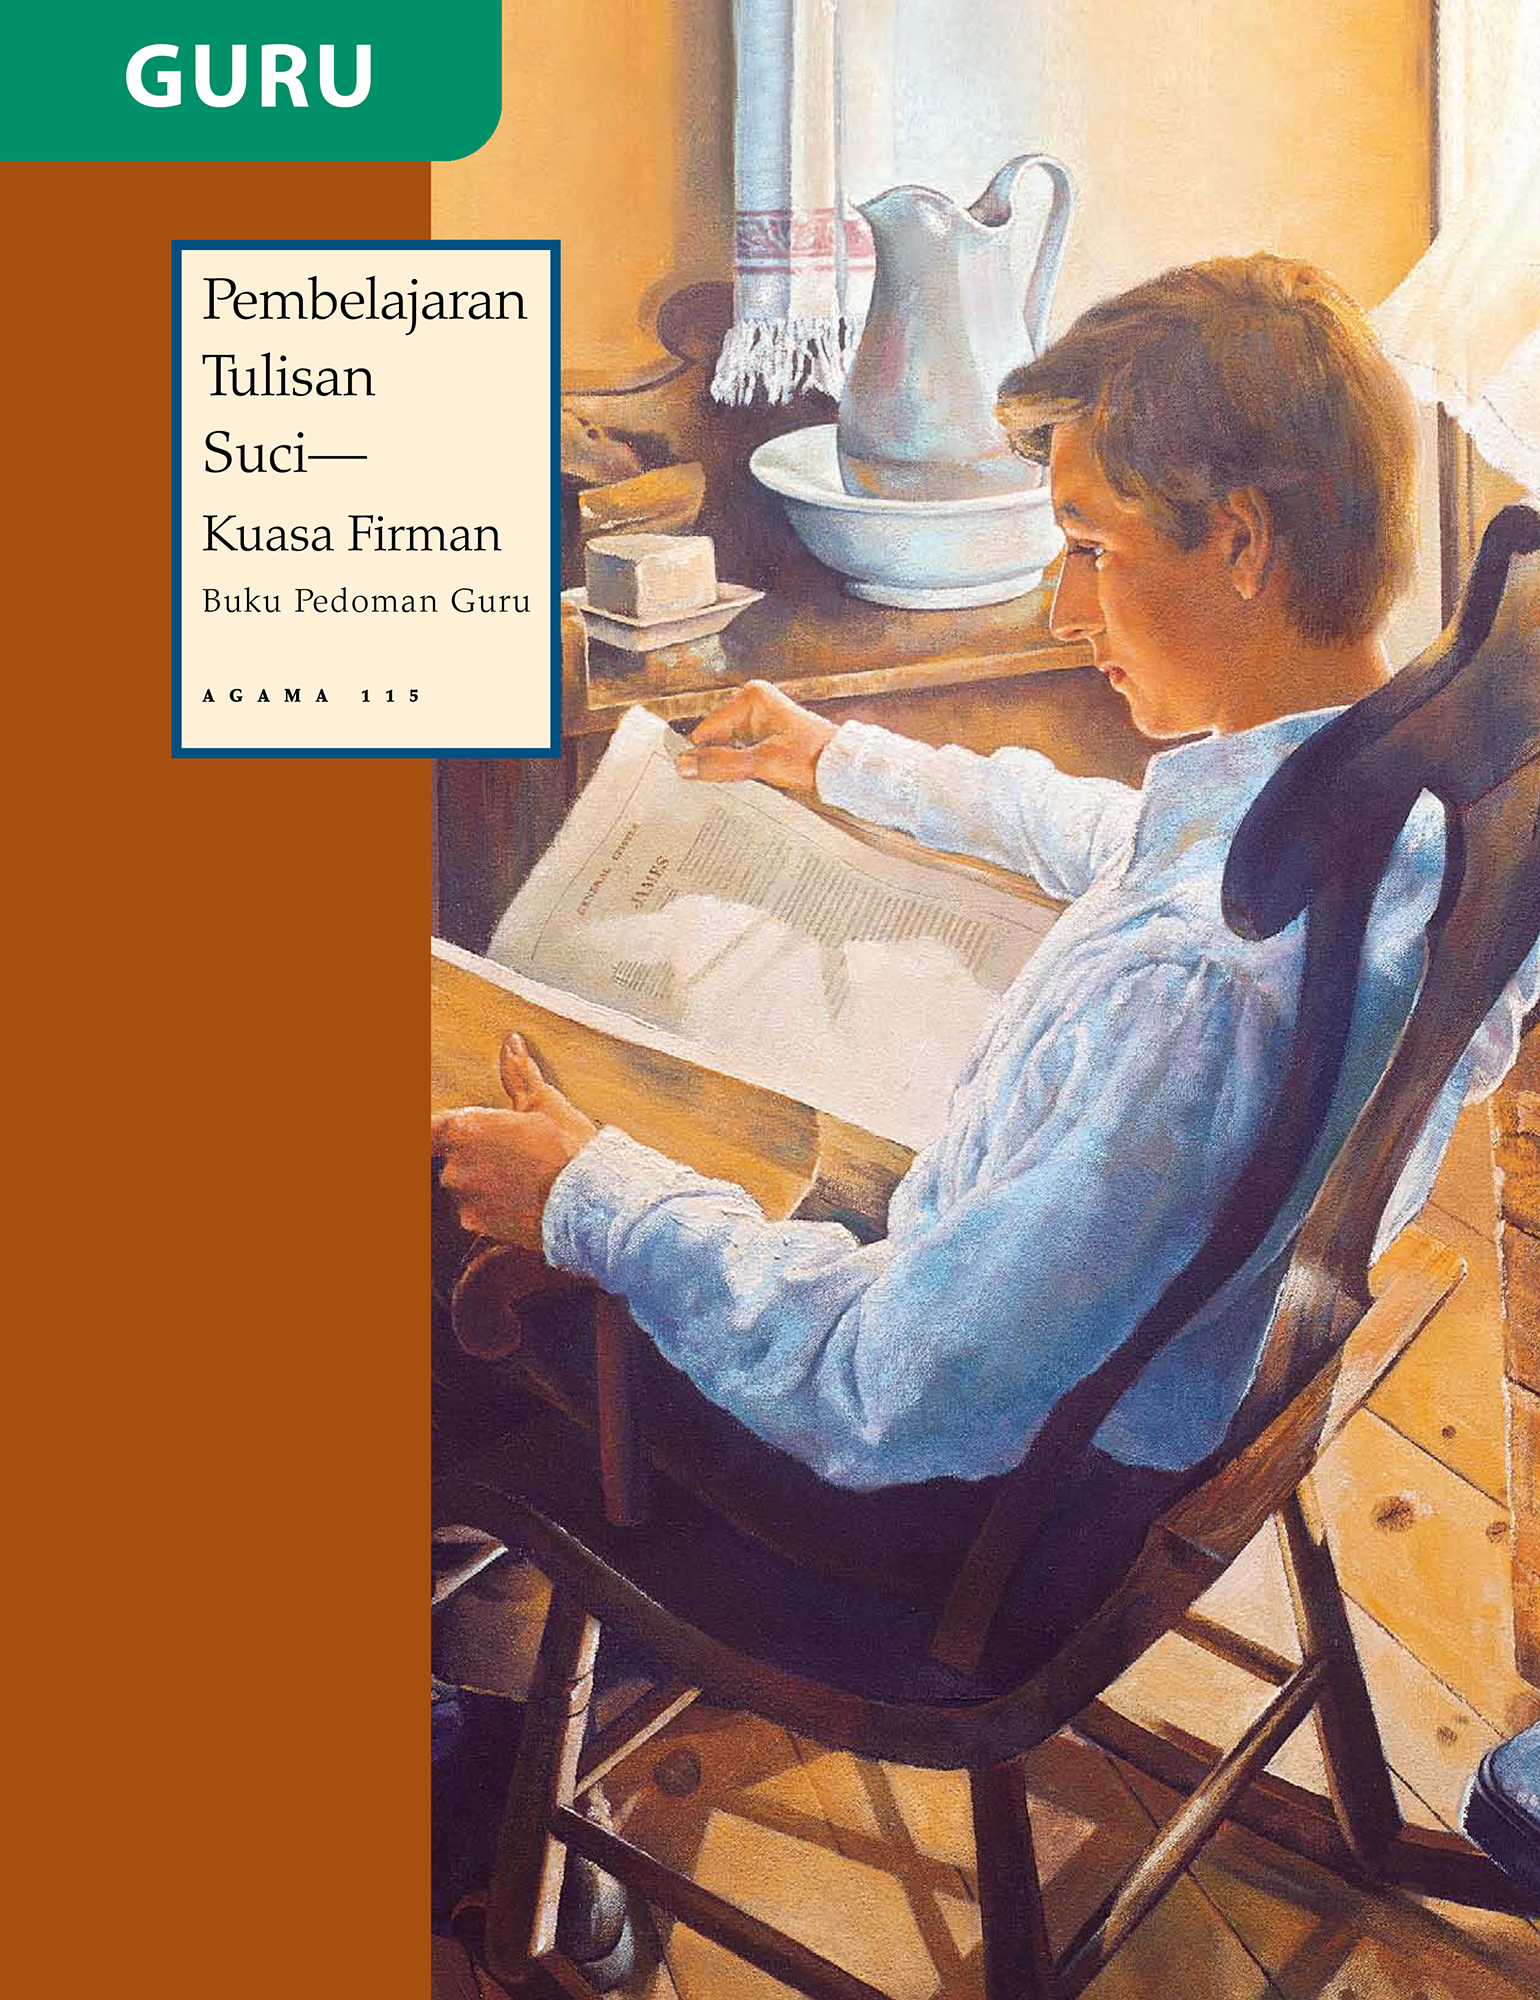 Buku Pedoman Guru Penelaahan Tulisan Suci—Kuasa Firman (Religi 115)